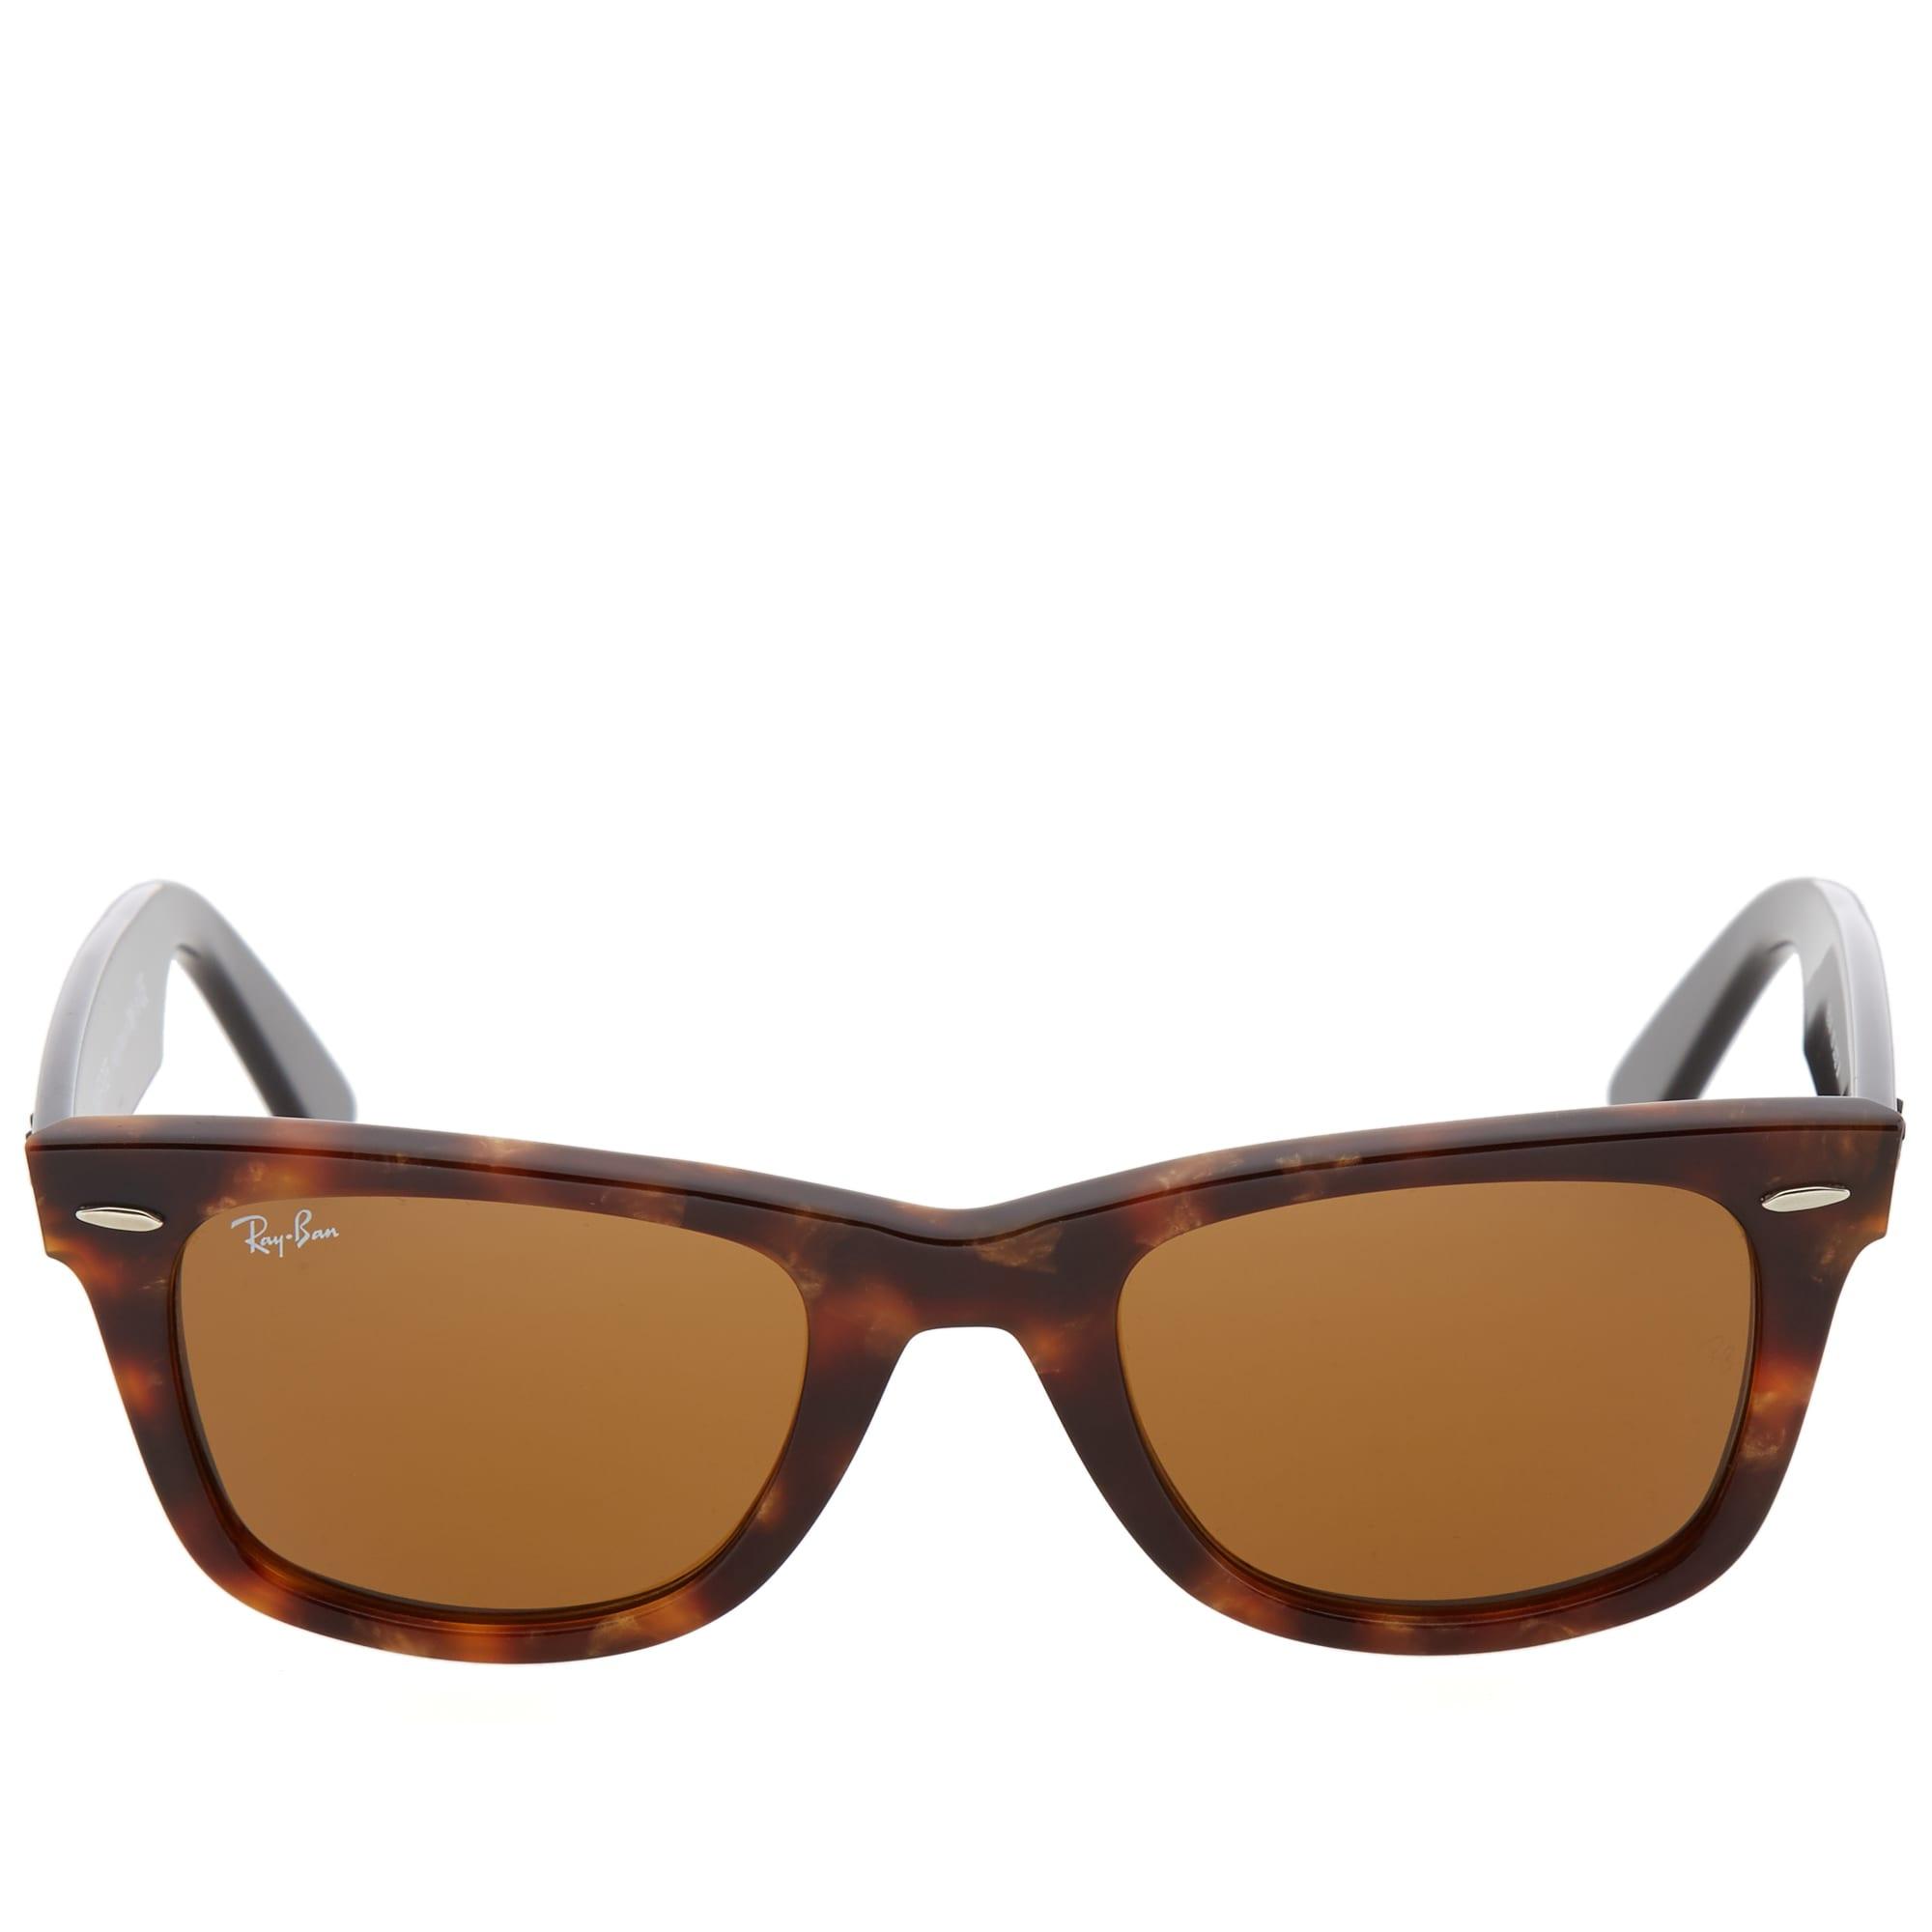 Ray Ban Original Wayfarer Fleck Sunglasses - Spotted Brown Havana & Brown